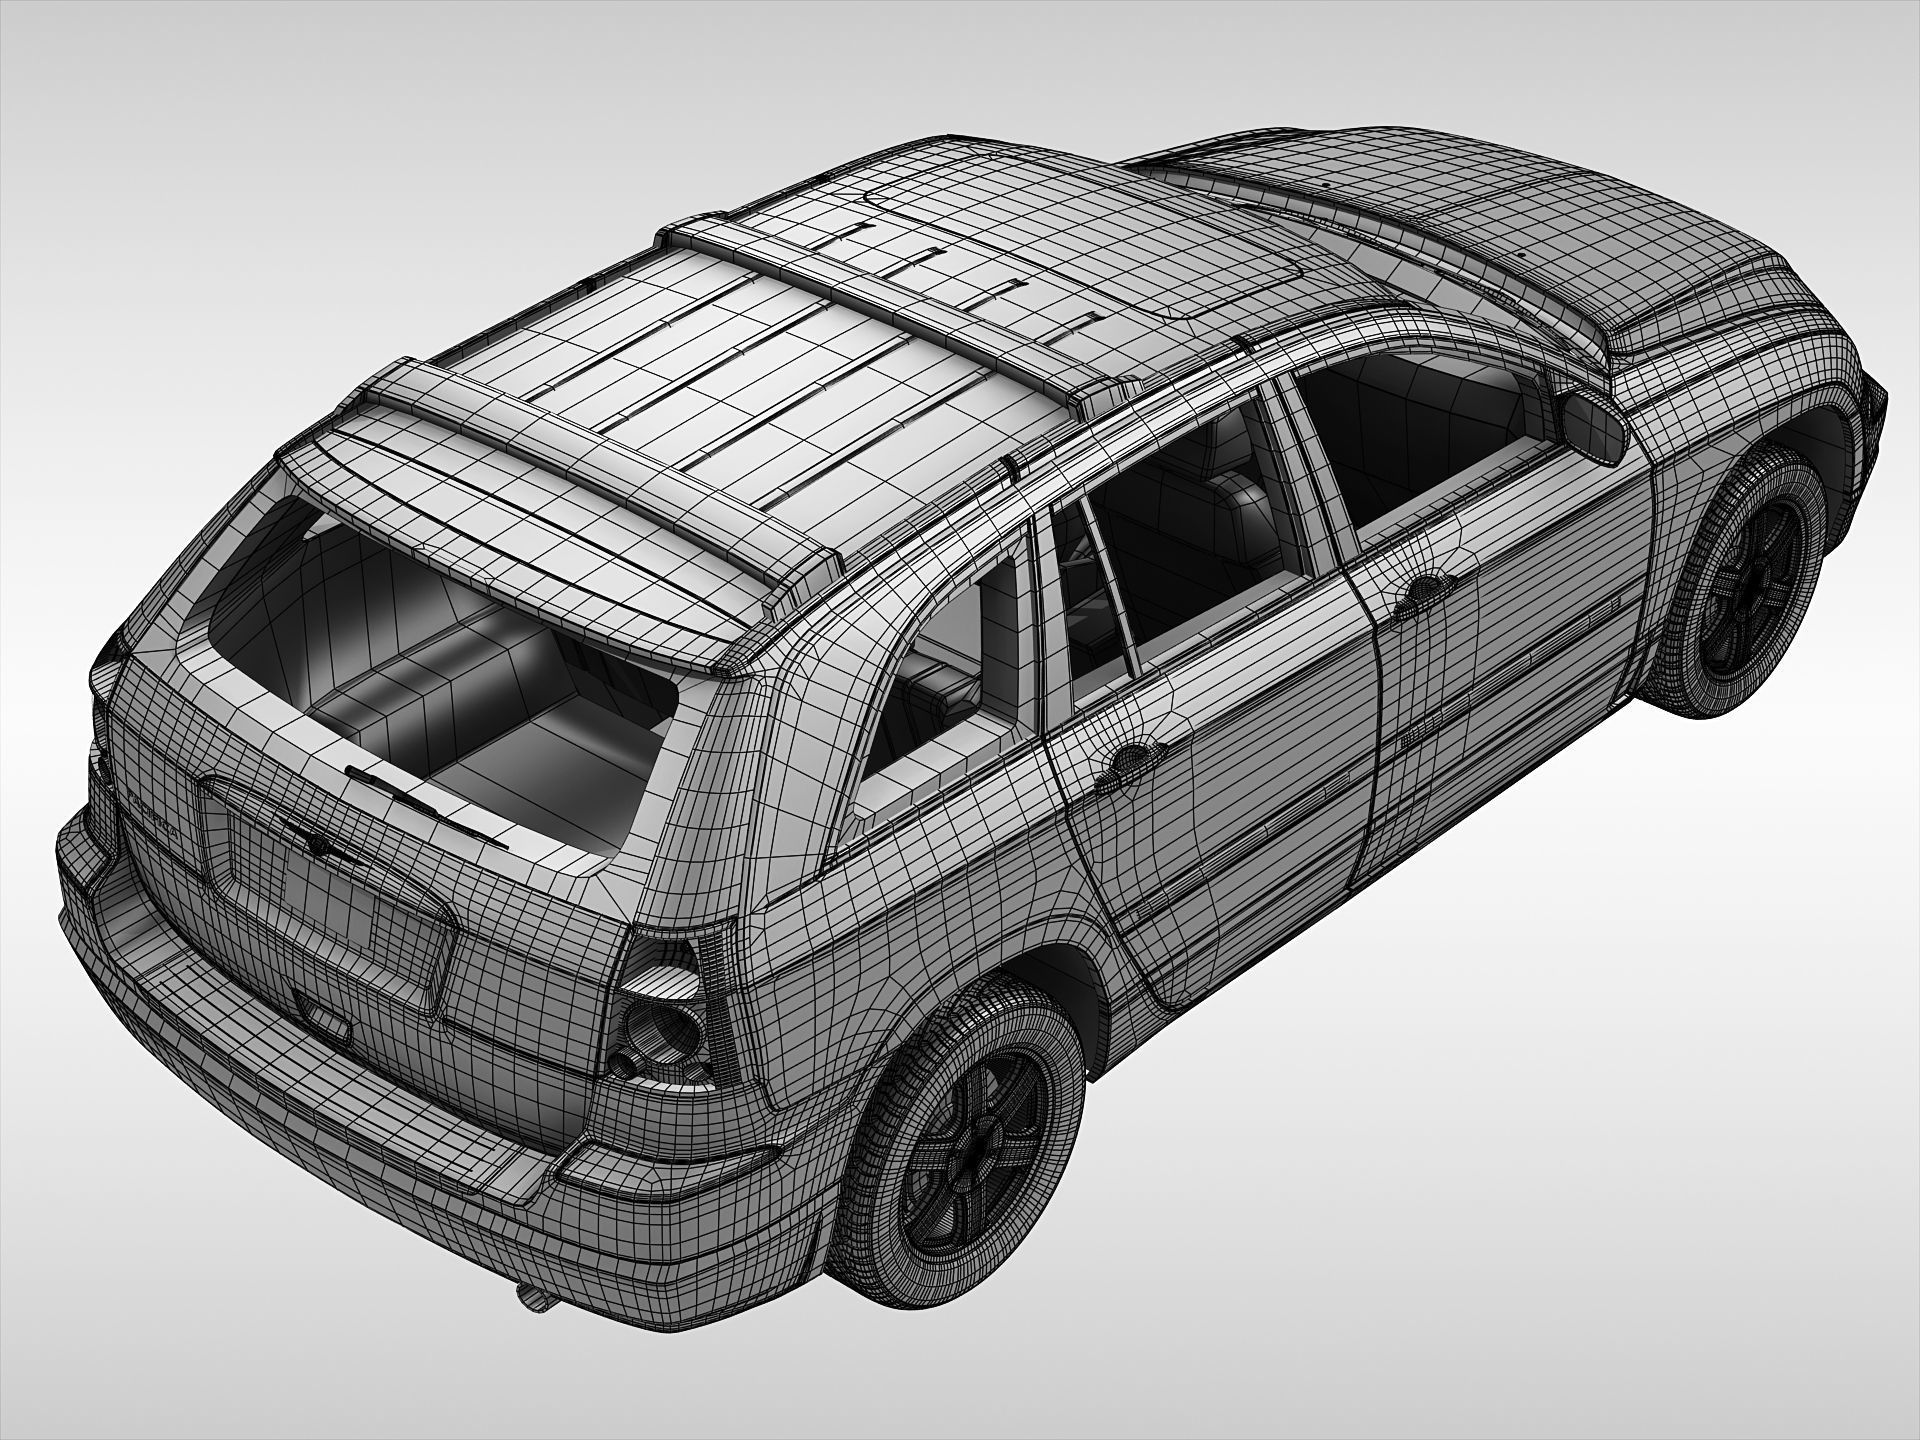 htm tags models dodge list the luther post ram blog index brookdale suv chrysler automotive jeep